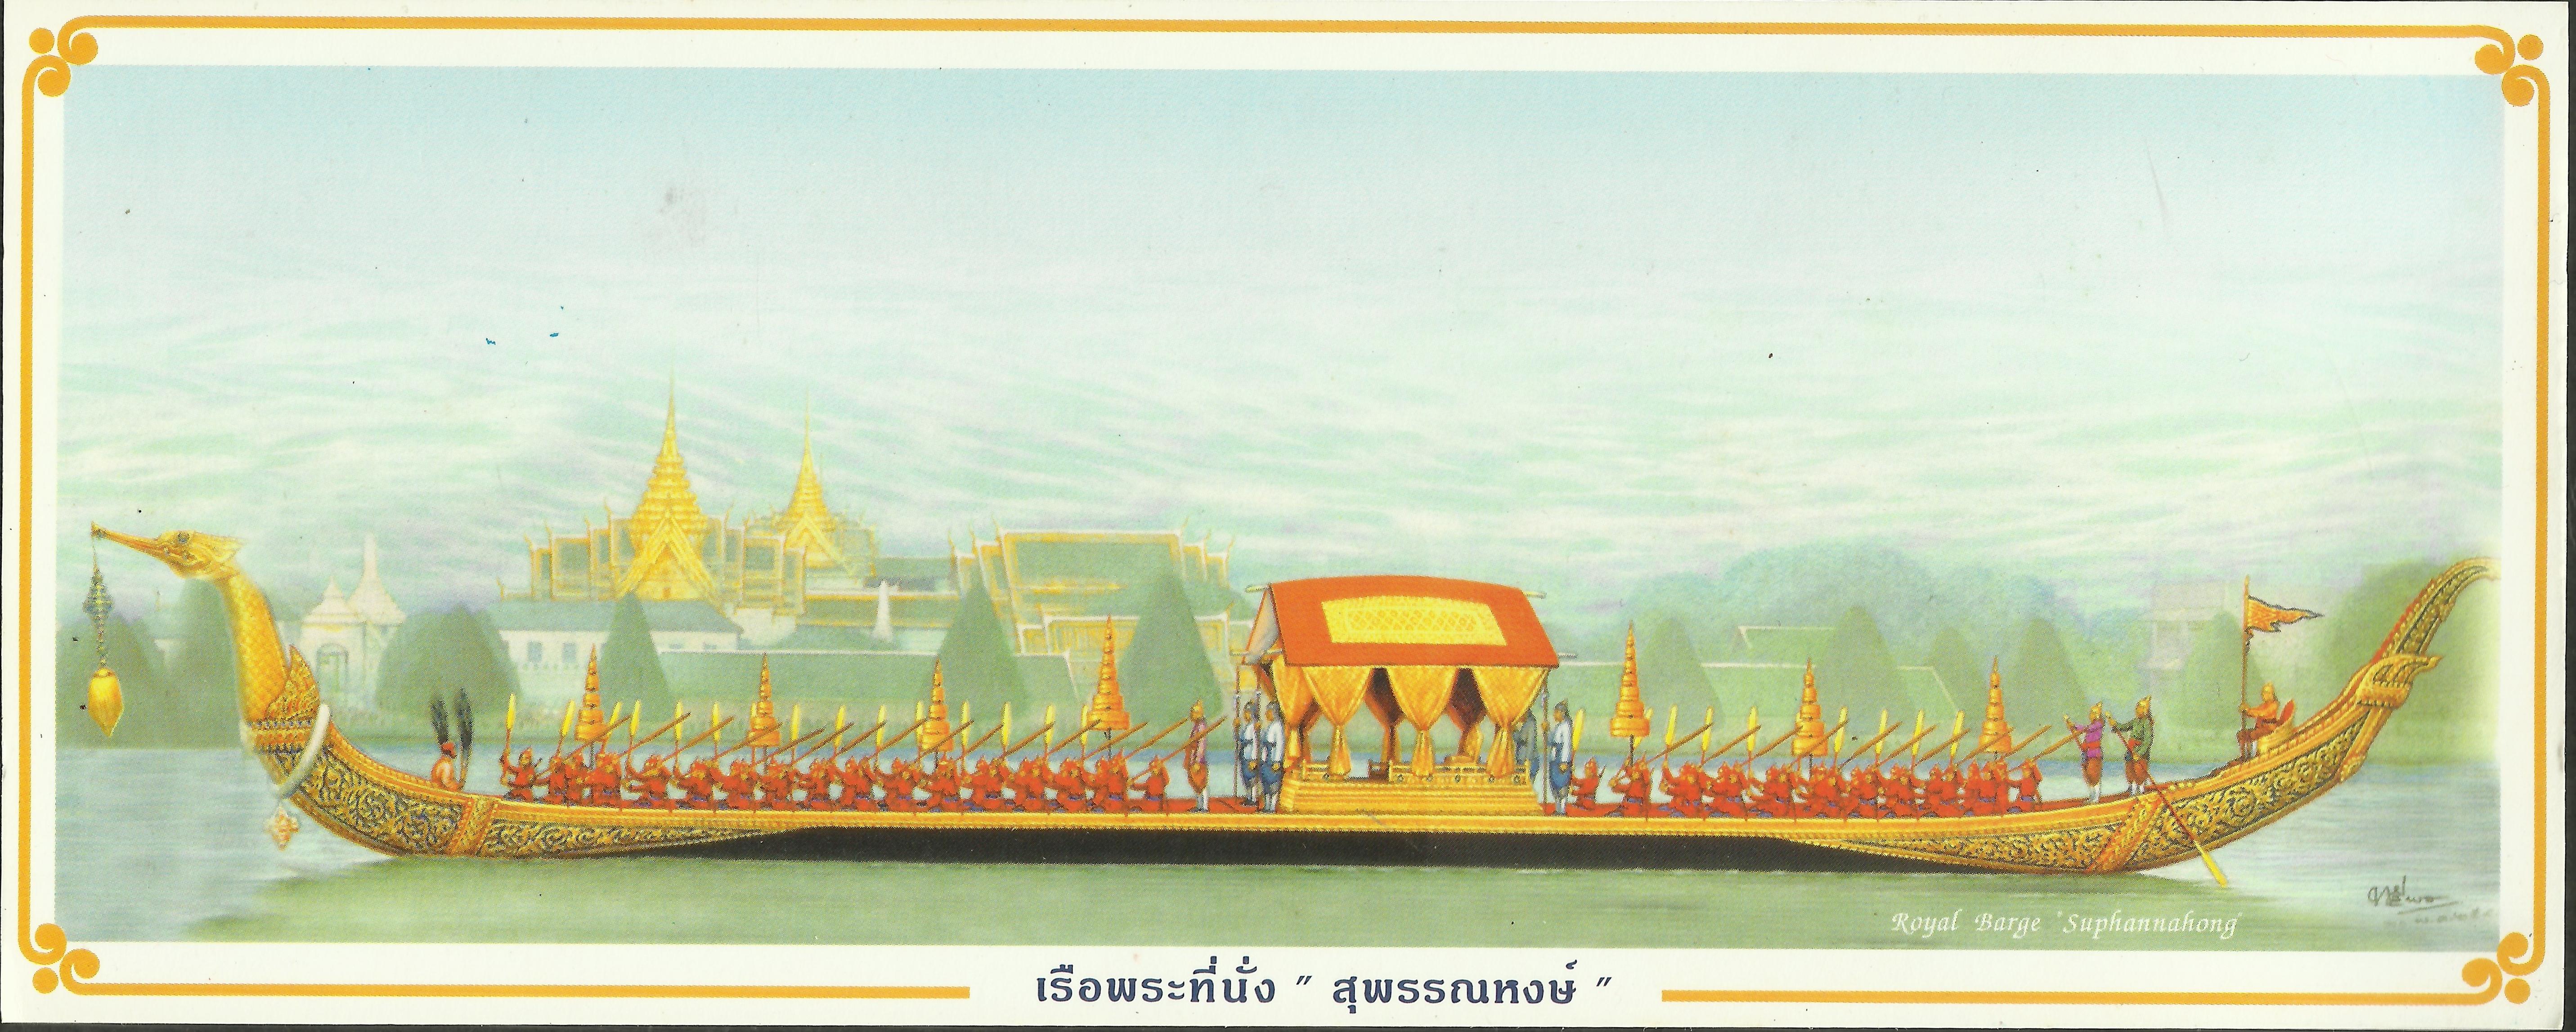 The Royal Barge <em>Suphannahong</em>